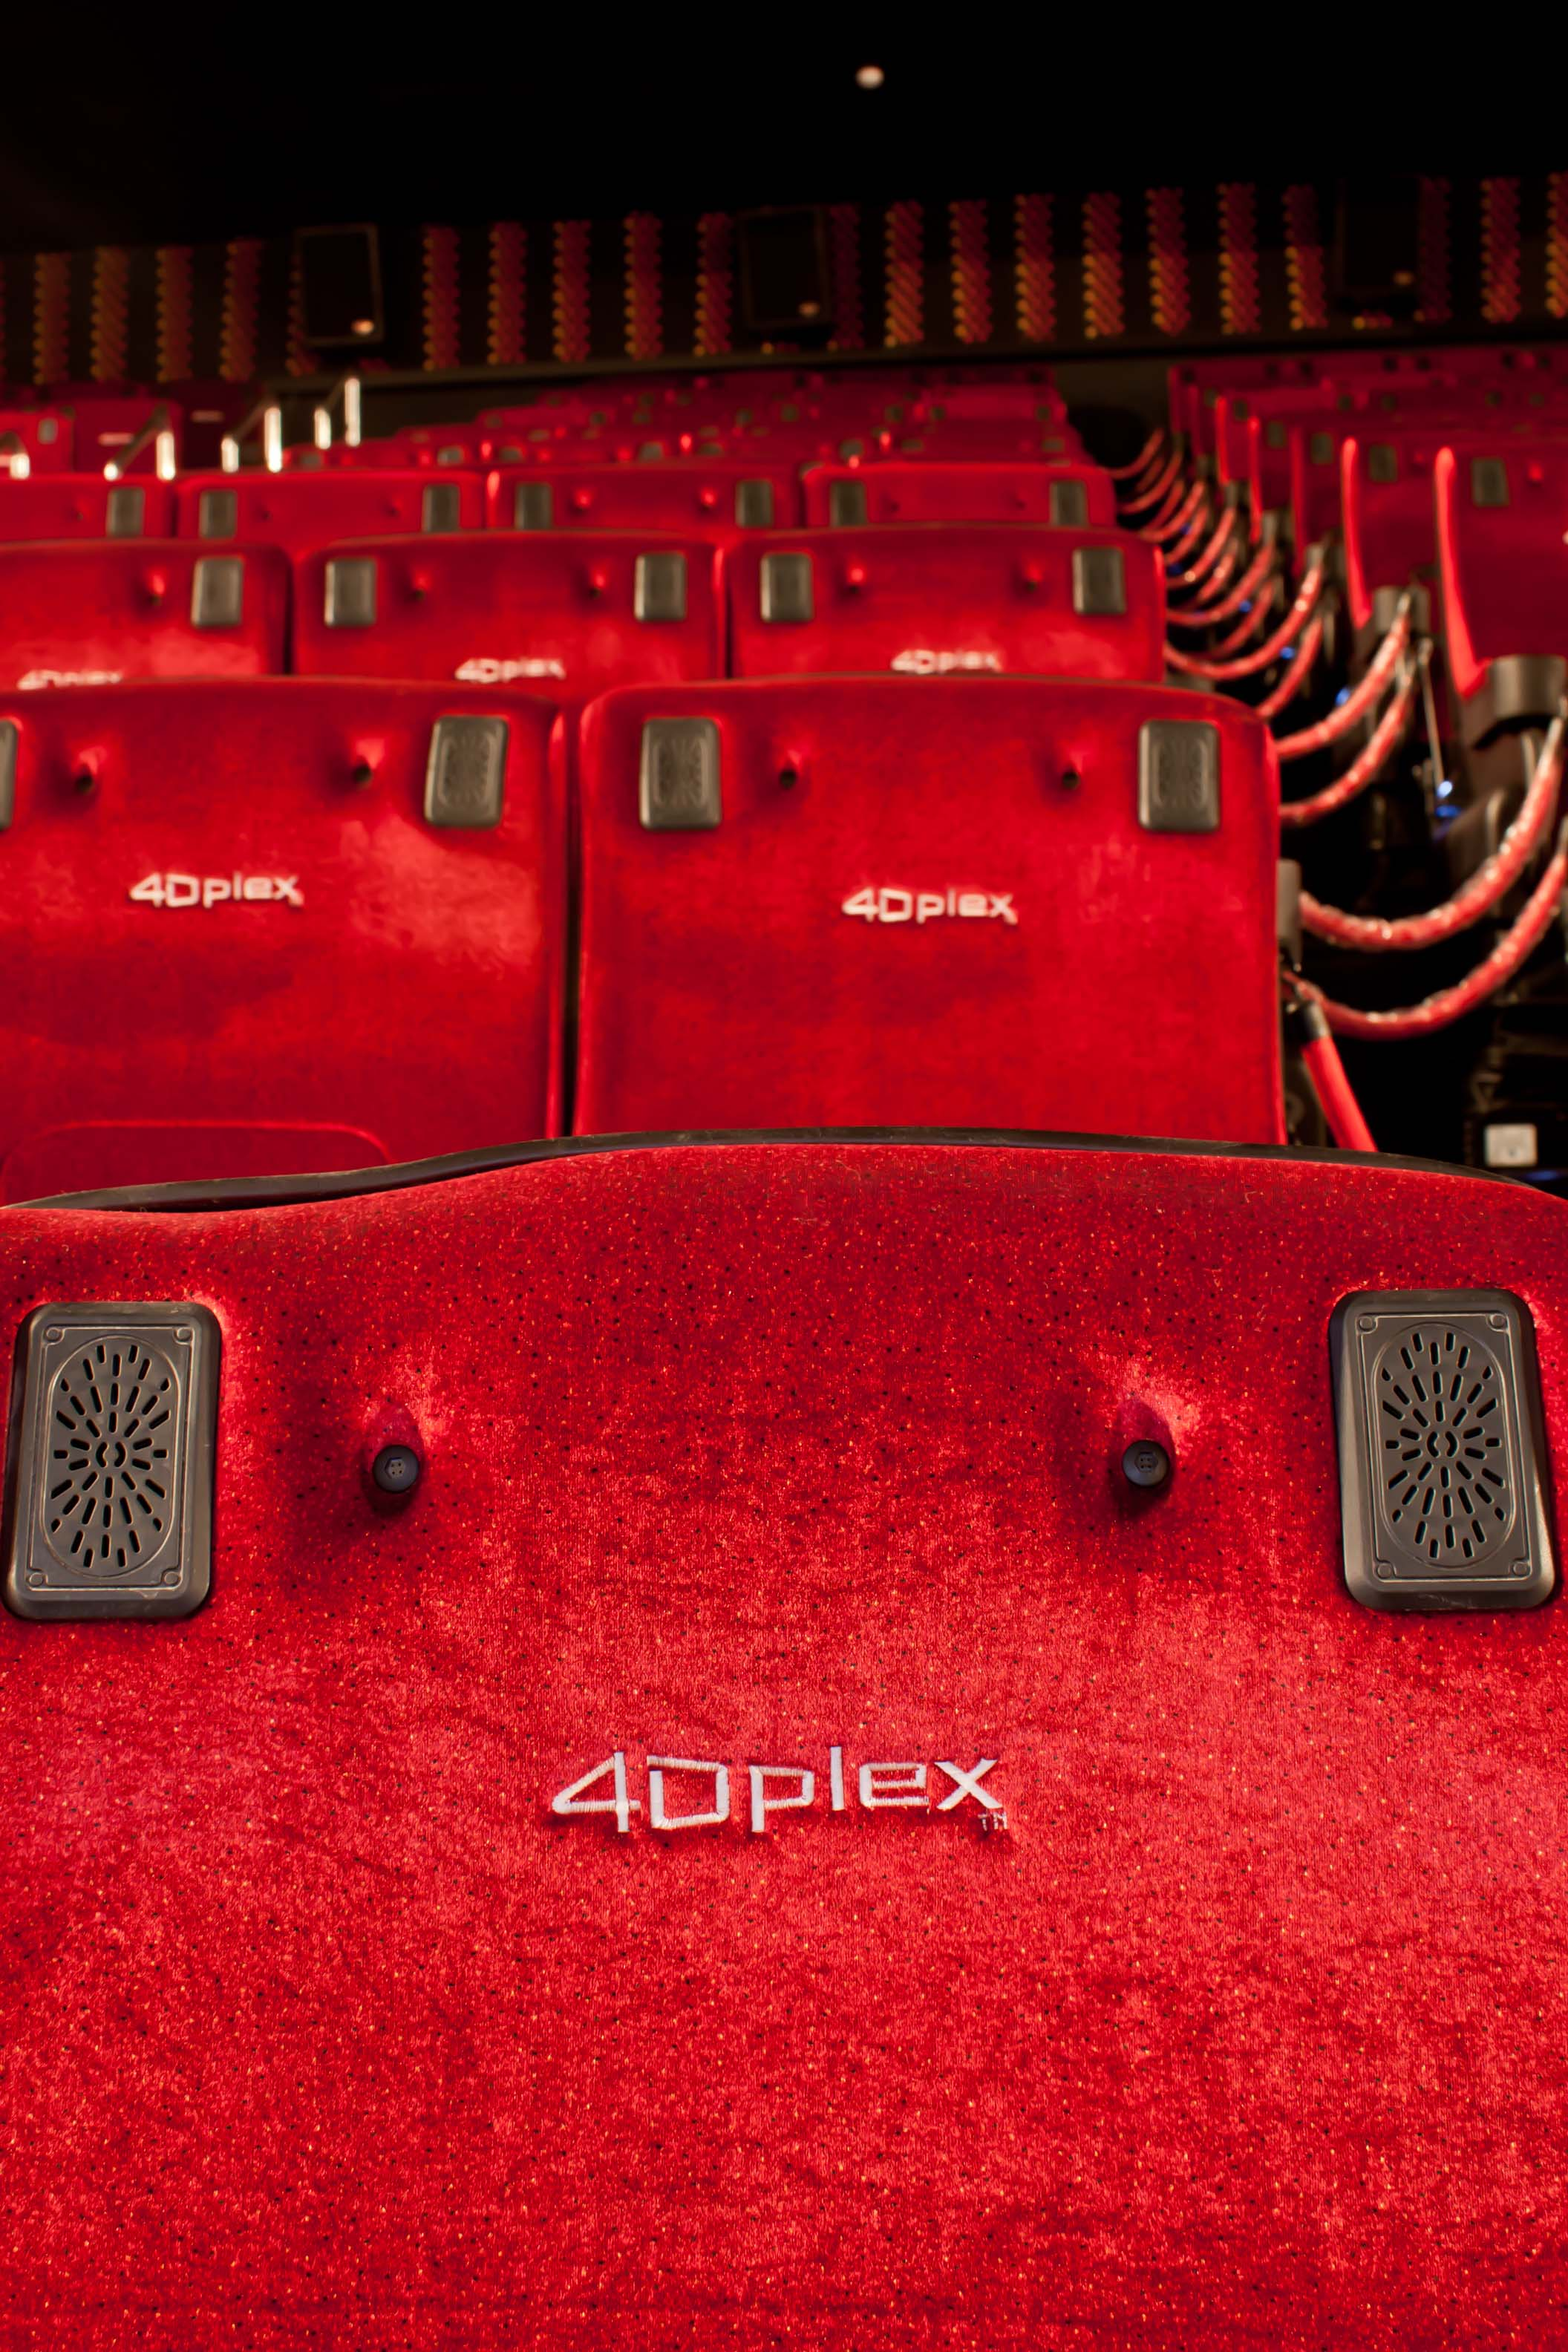 Cinema cin polis jk iguatemi s o paulo guia da semana for Sala 4dx opiniones